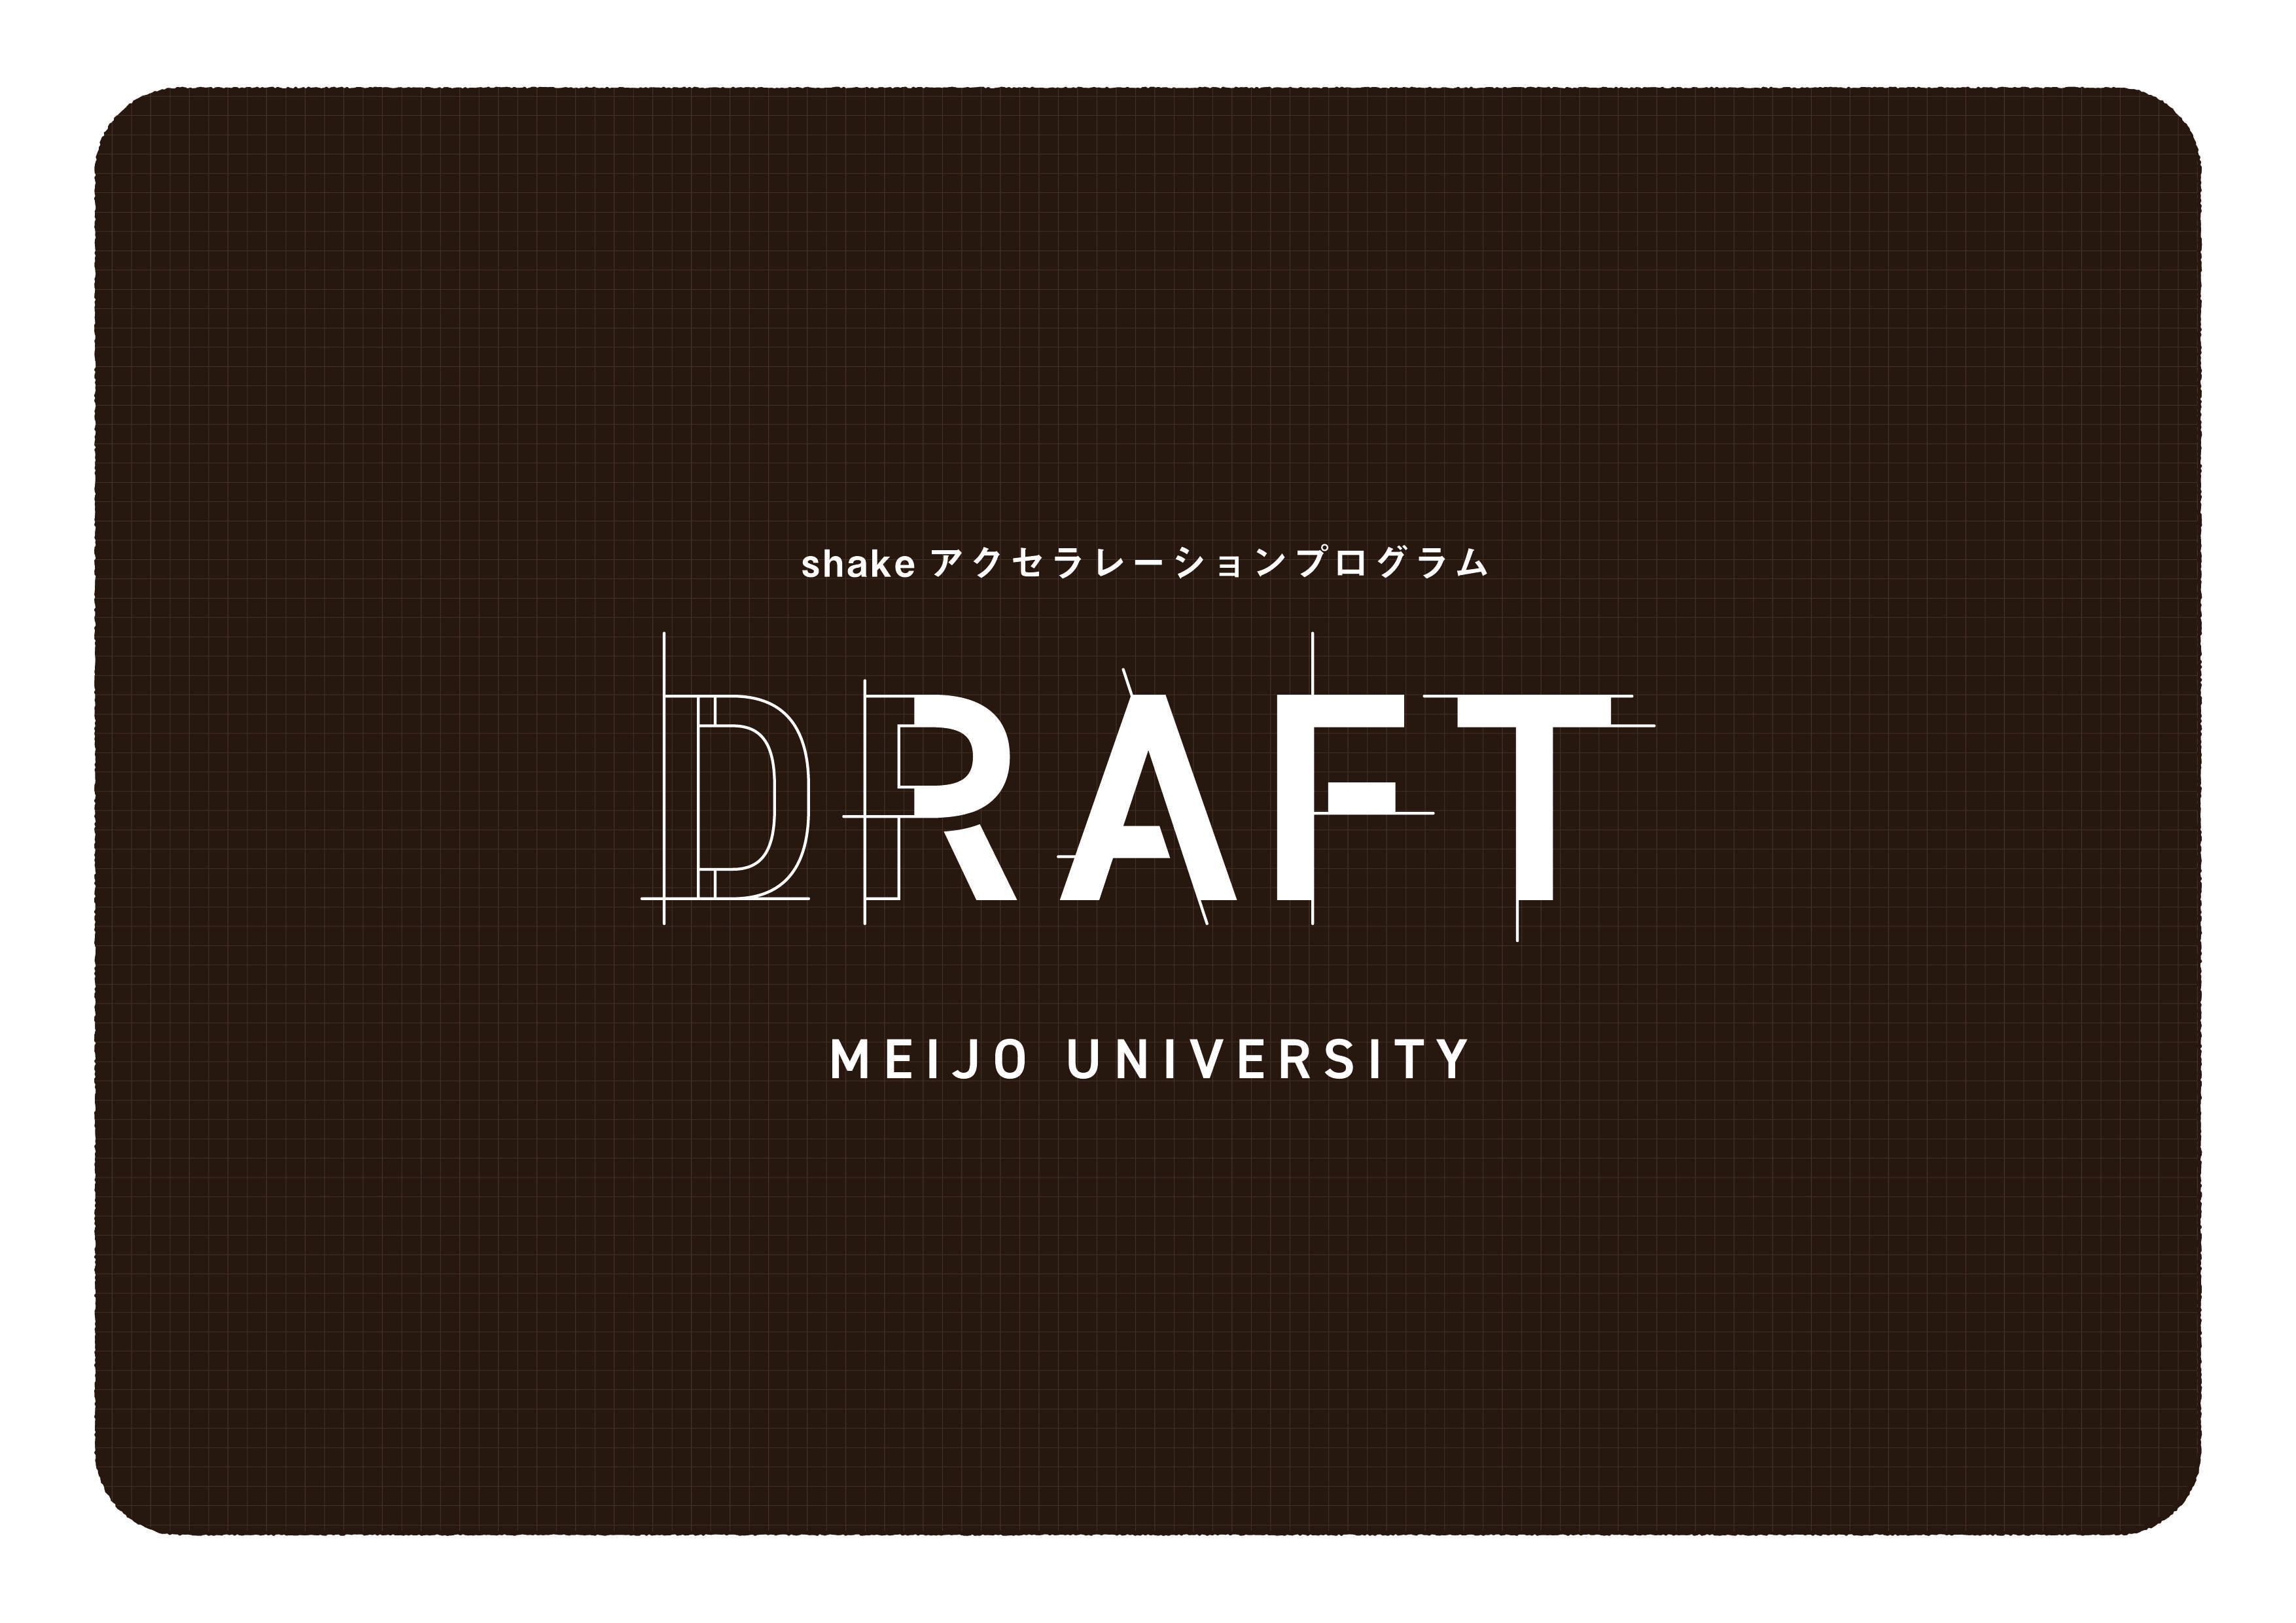 shakeアクセラレーションプログラム「DRAFT」始動! 第1期プロジェクト募集!